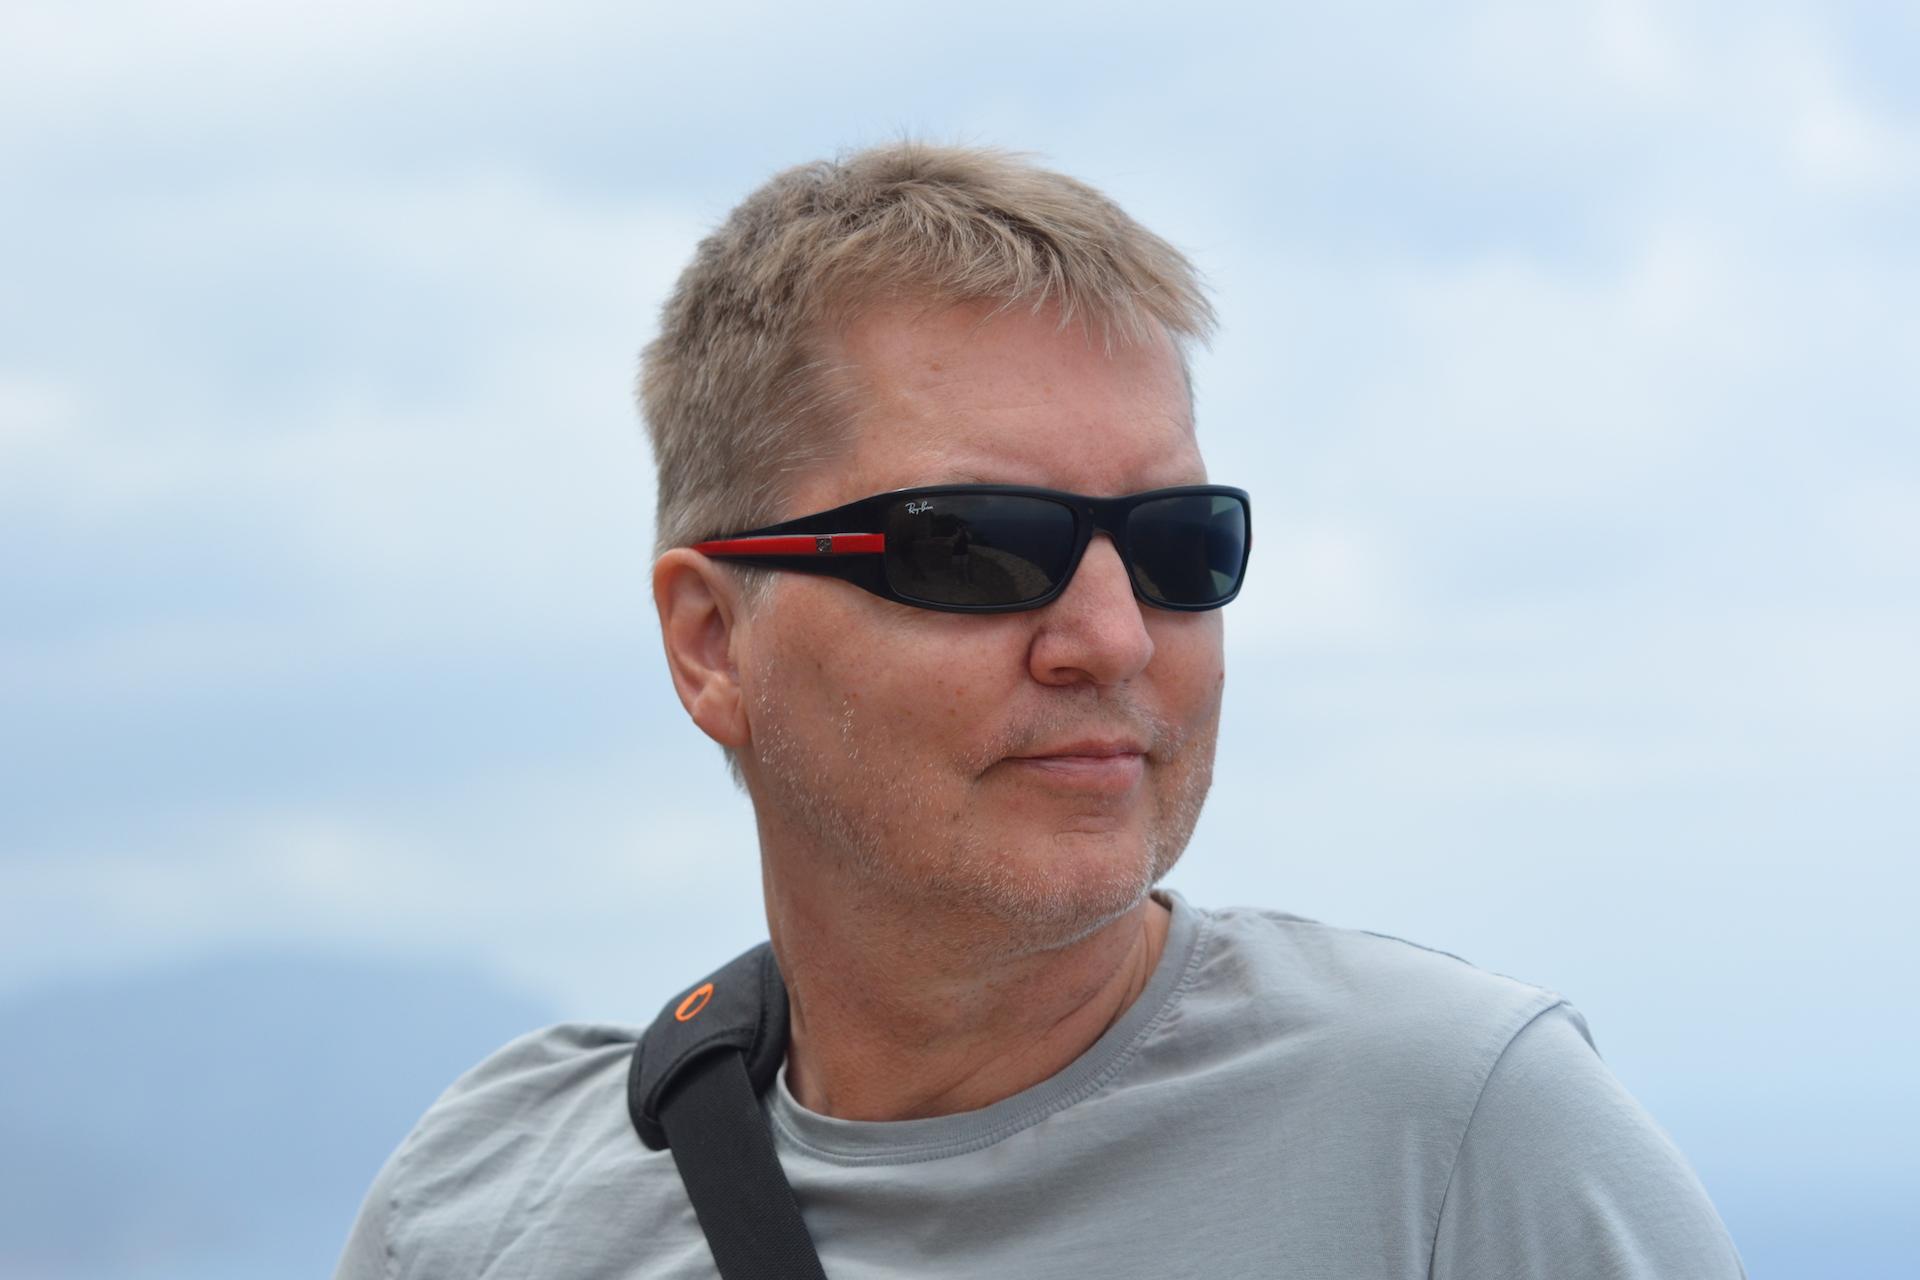 Frank Luchs